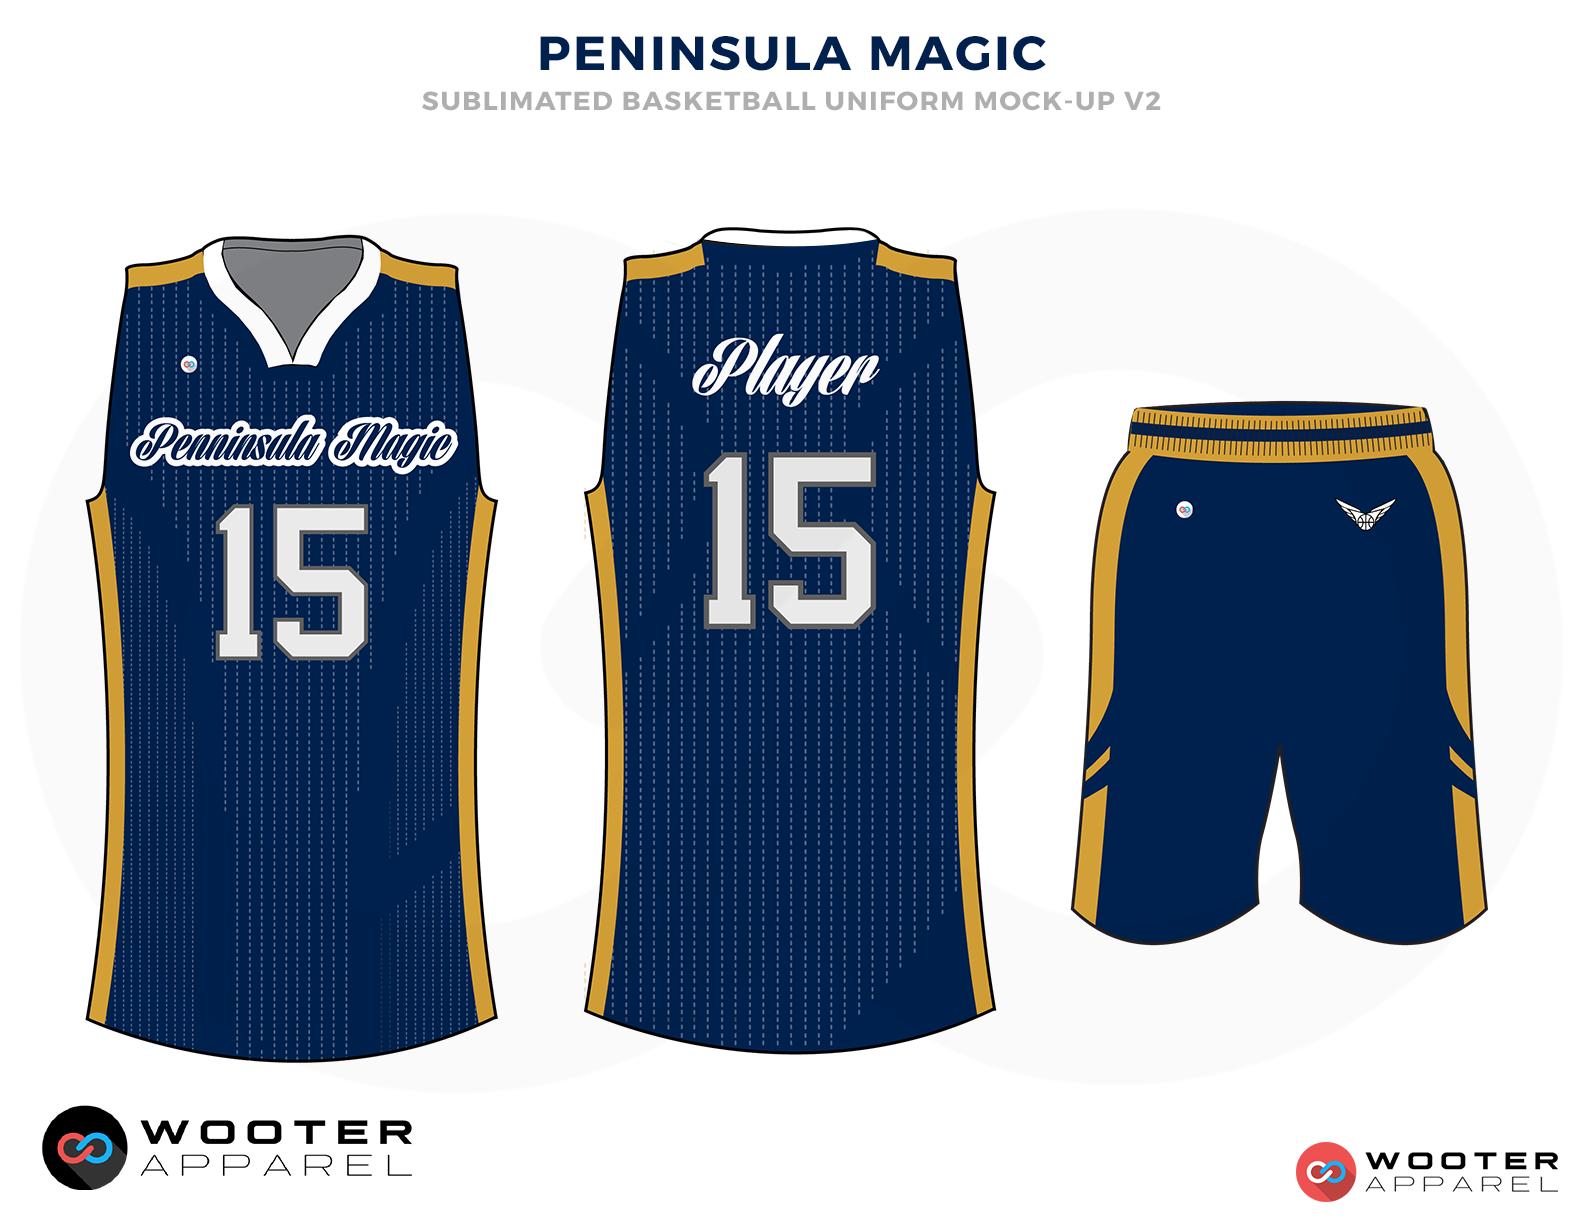 PANINDULA MAGIC Blue Golden and White Basketball Uniforms, Jersey and Shorts